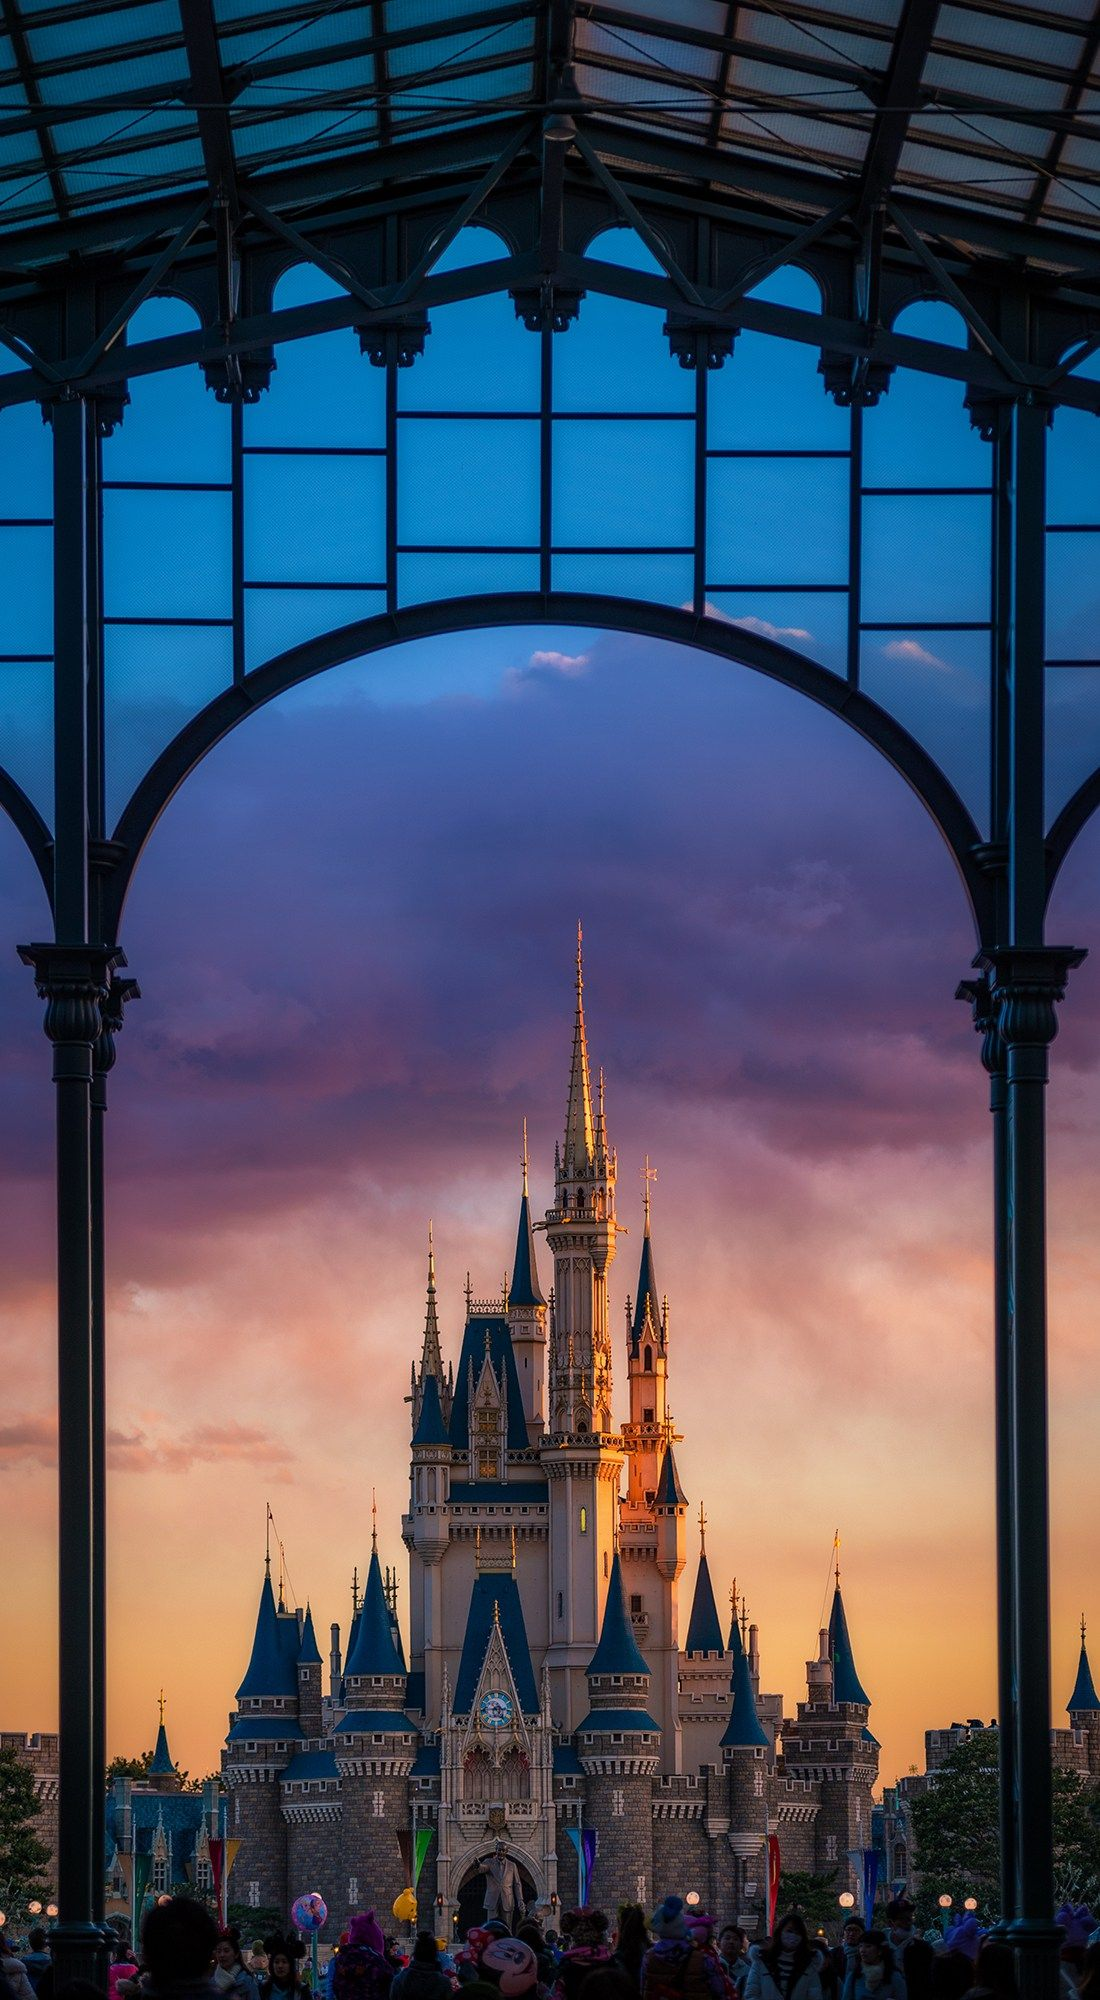 Disney Iphone Wallpapers Top Free Disney Iphone Backgrounds Wallpaperaccess